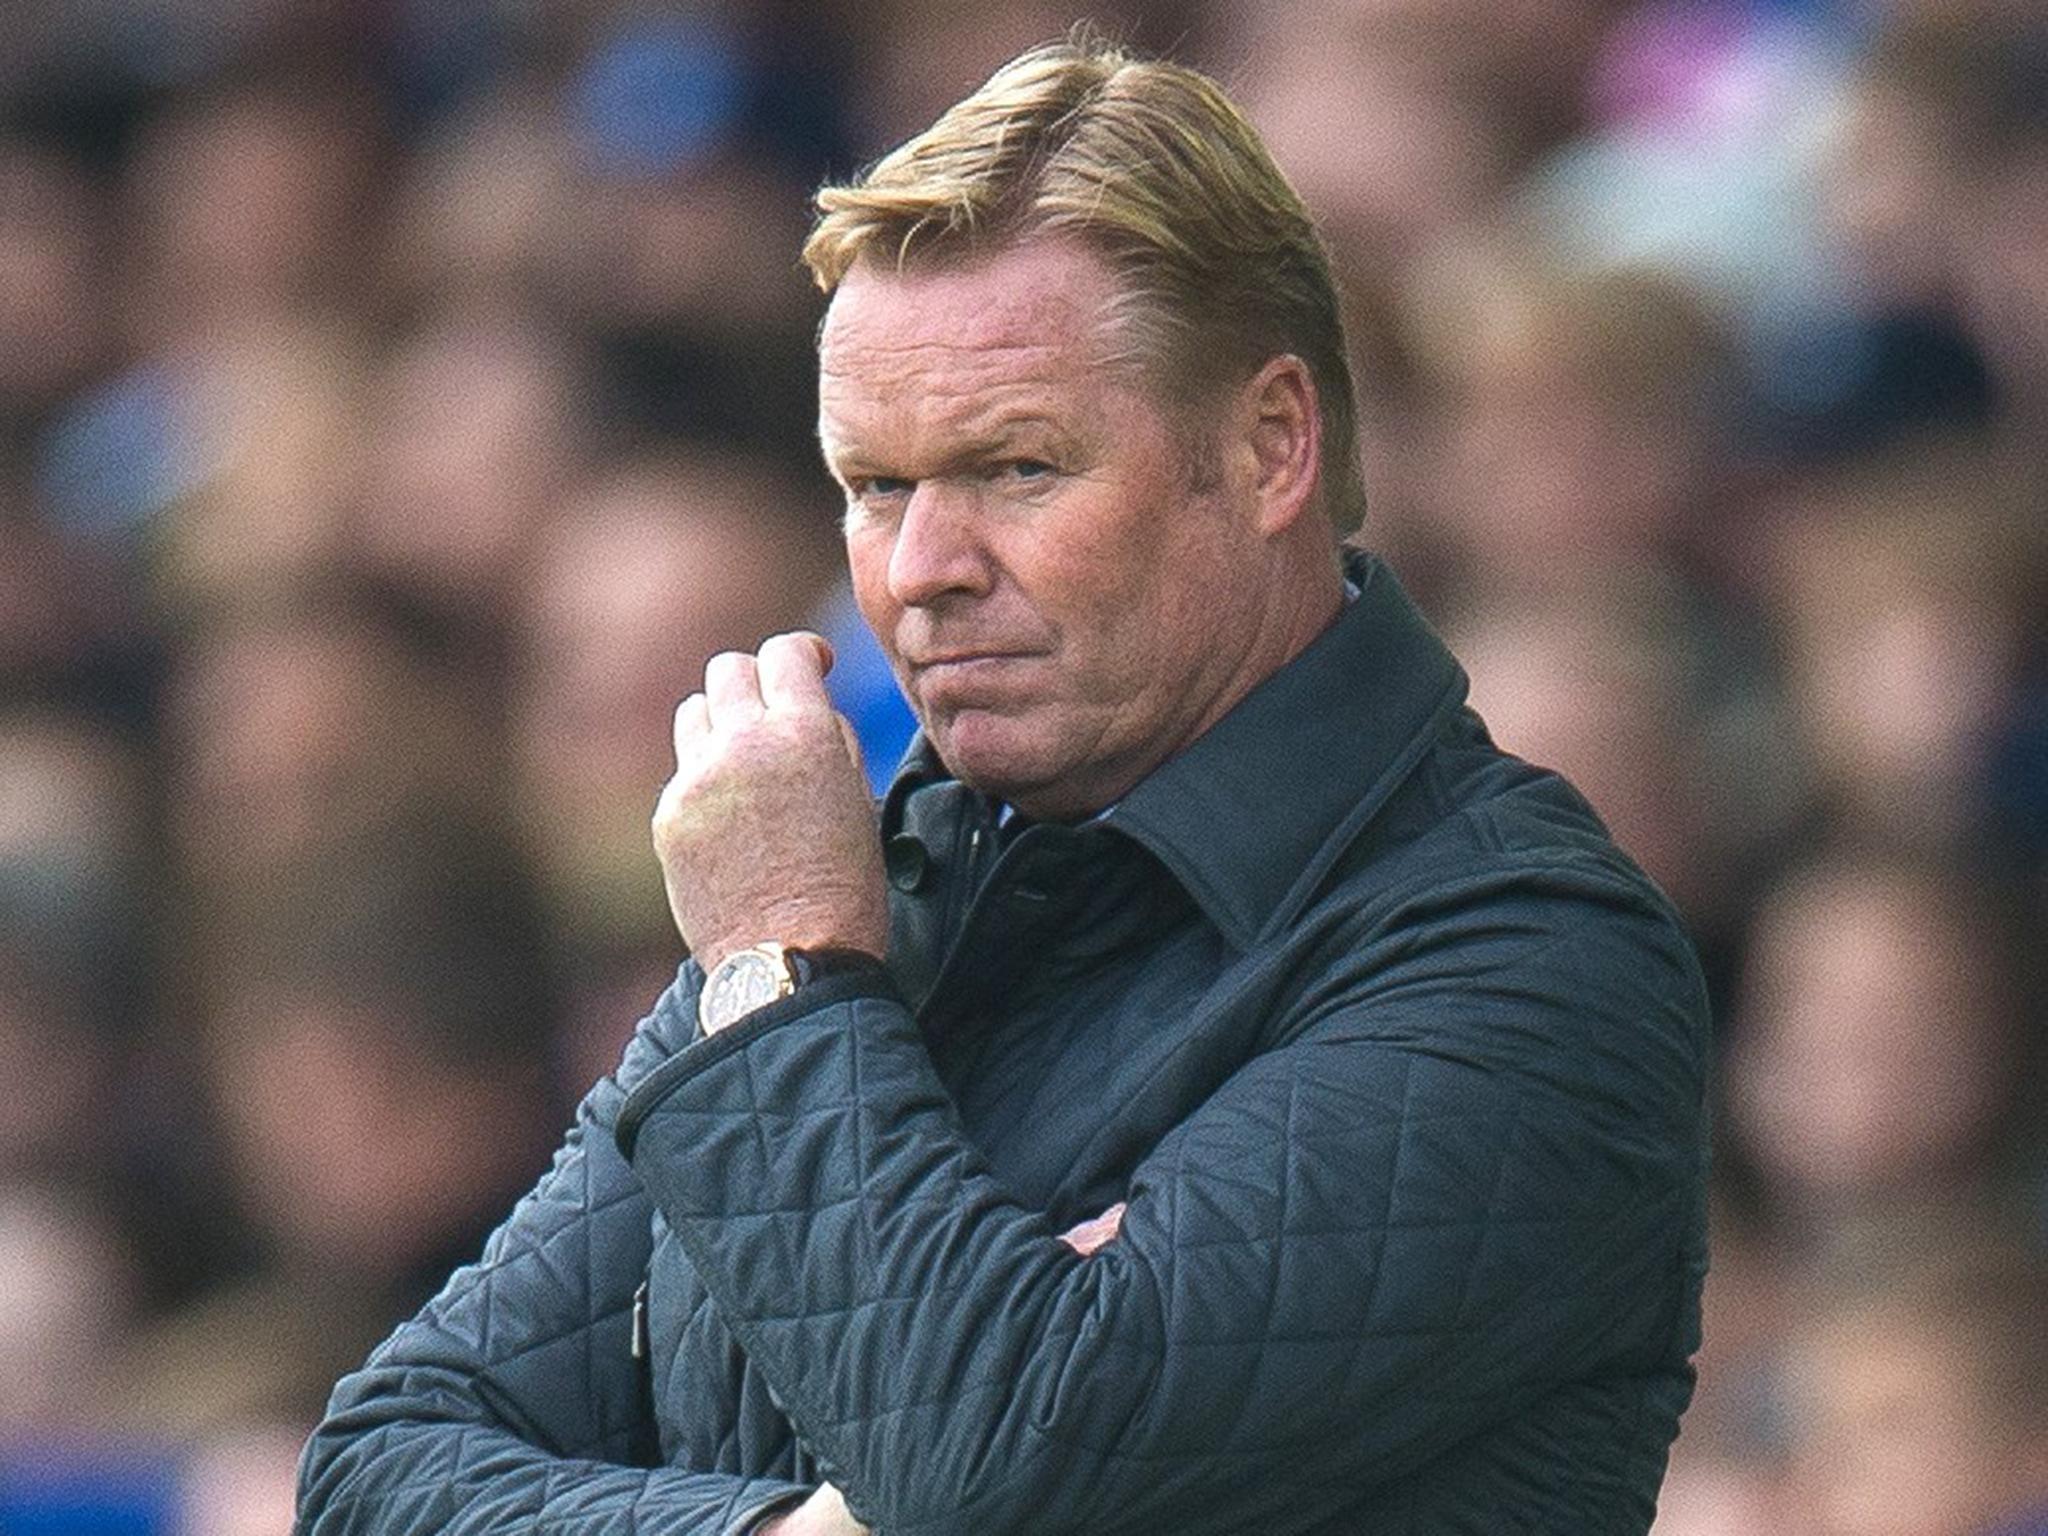 Ronald Koeman appointed Netherlands boss months after Everton sack